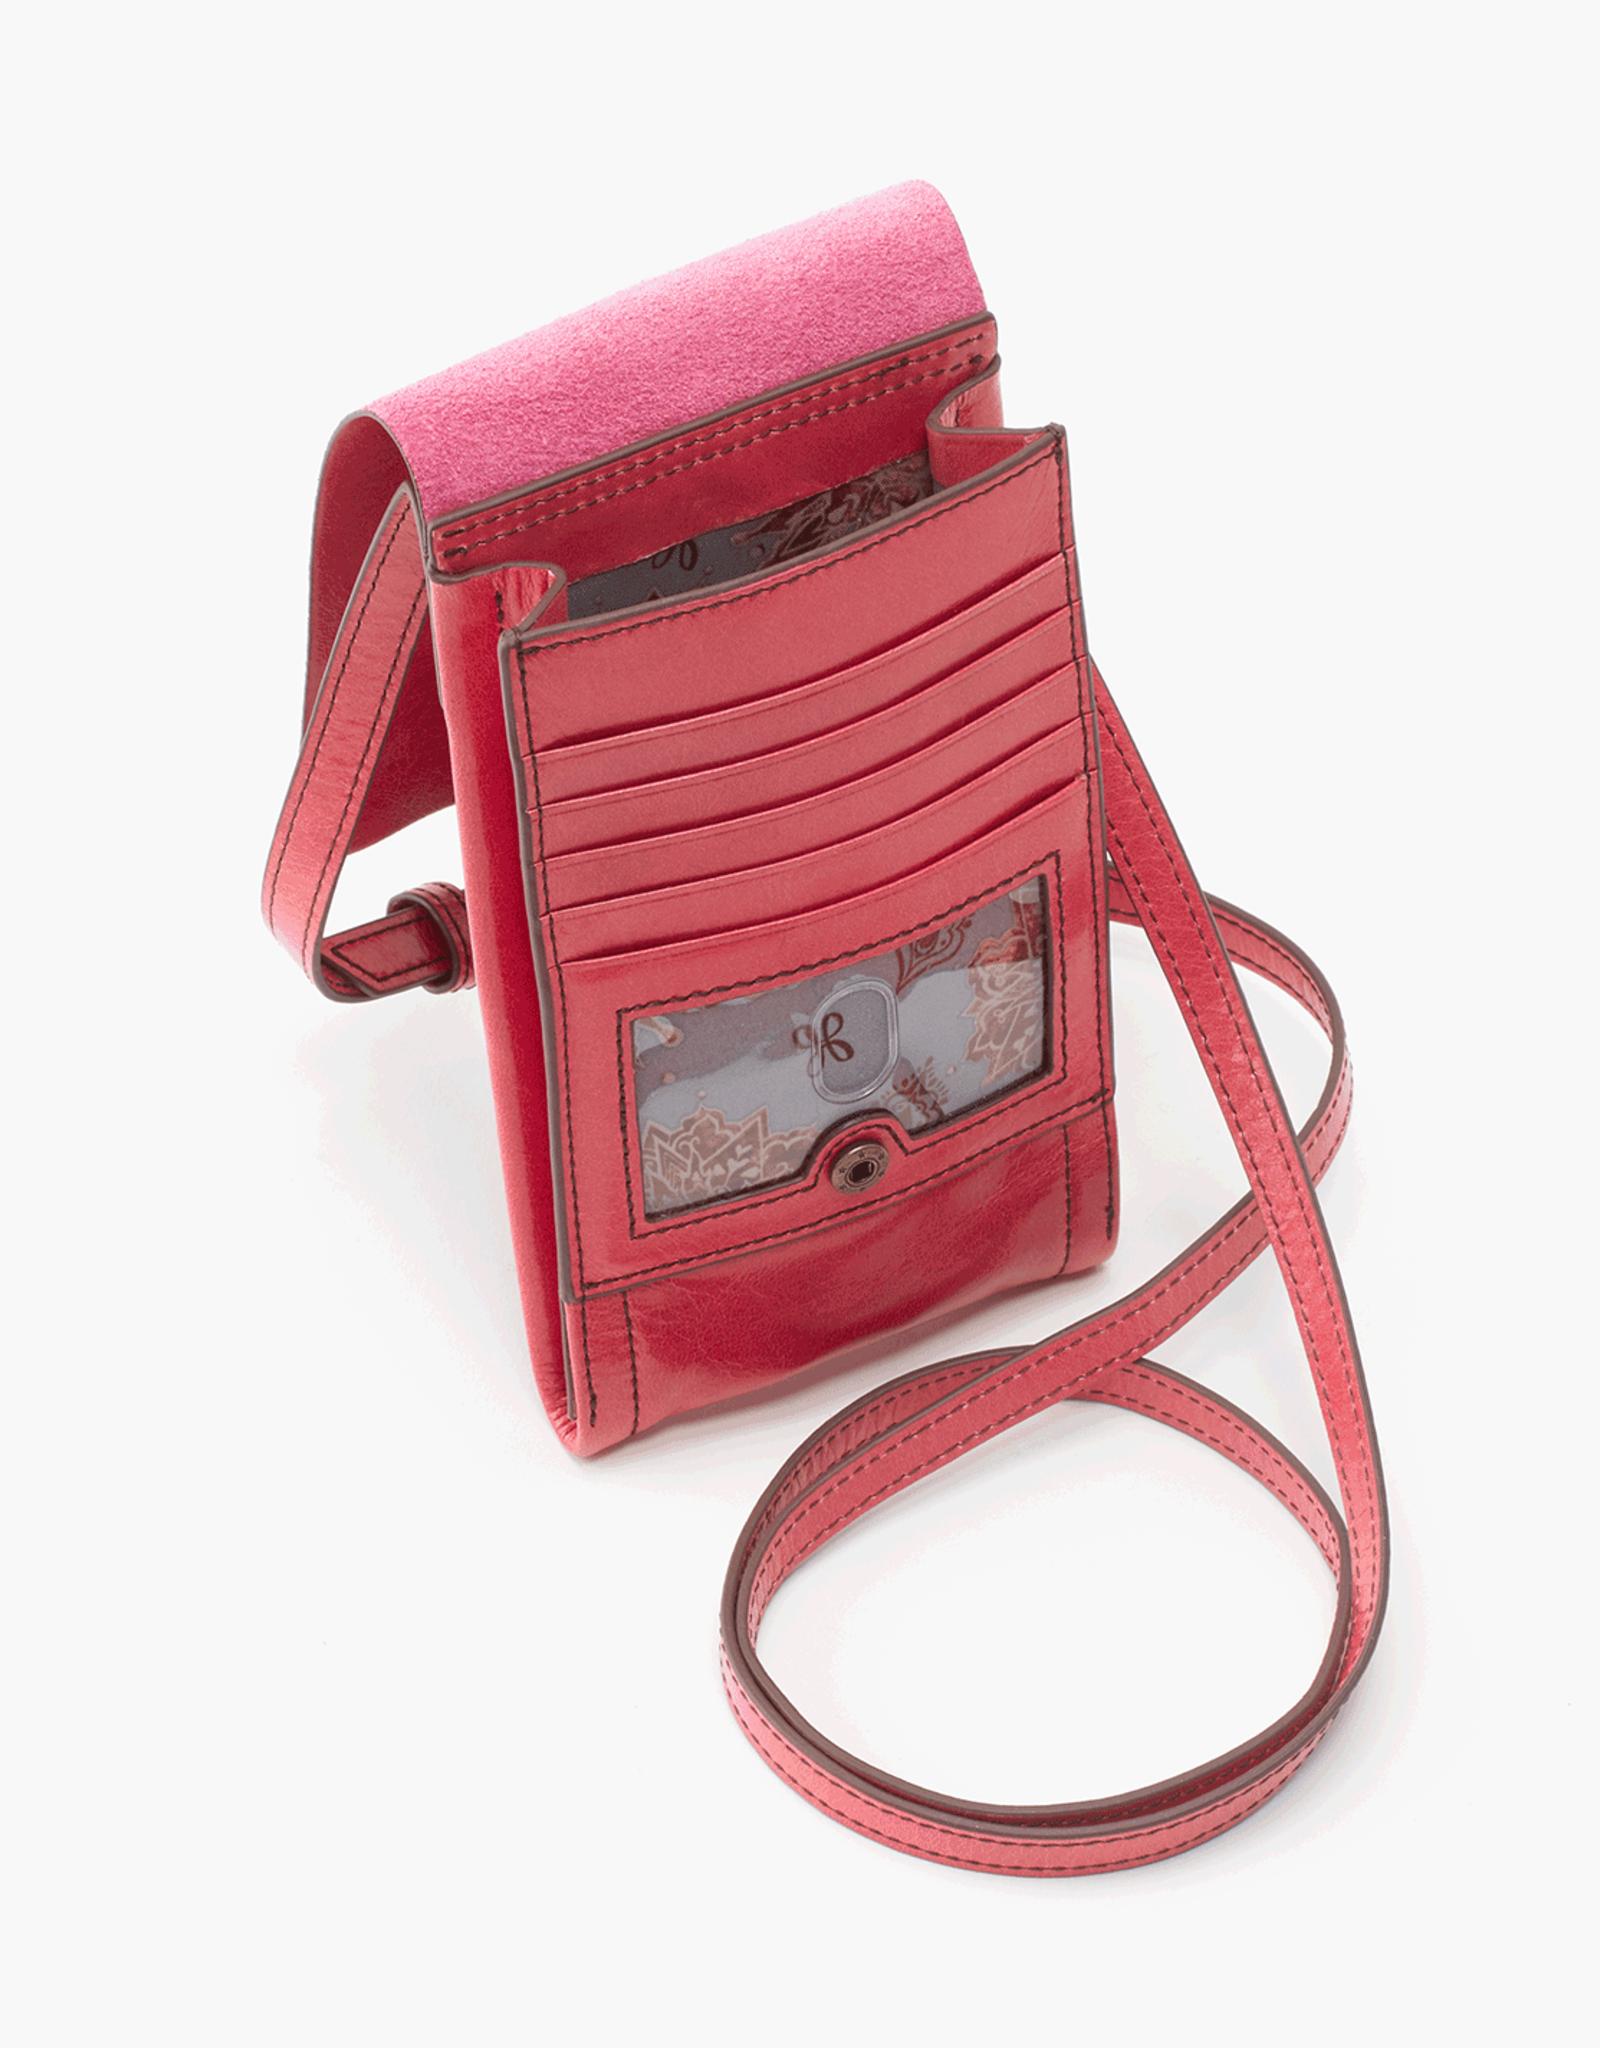 HOBO HOBO Token Wallet Crossbody